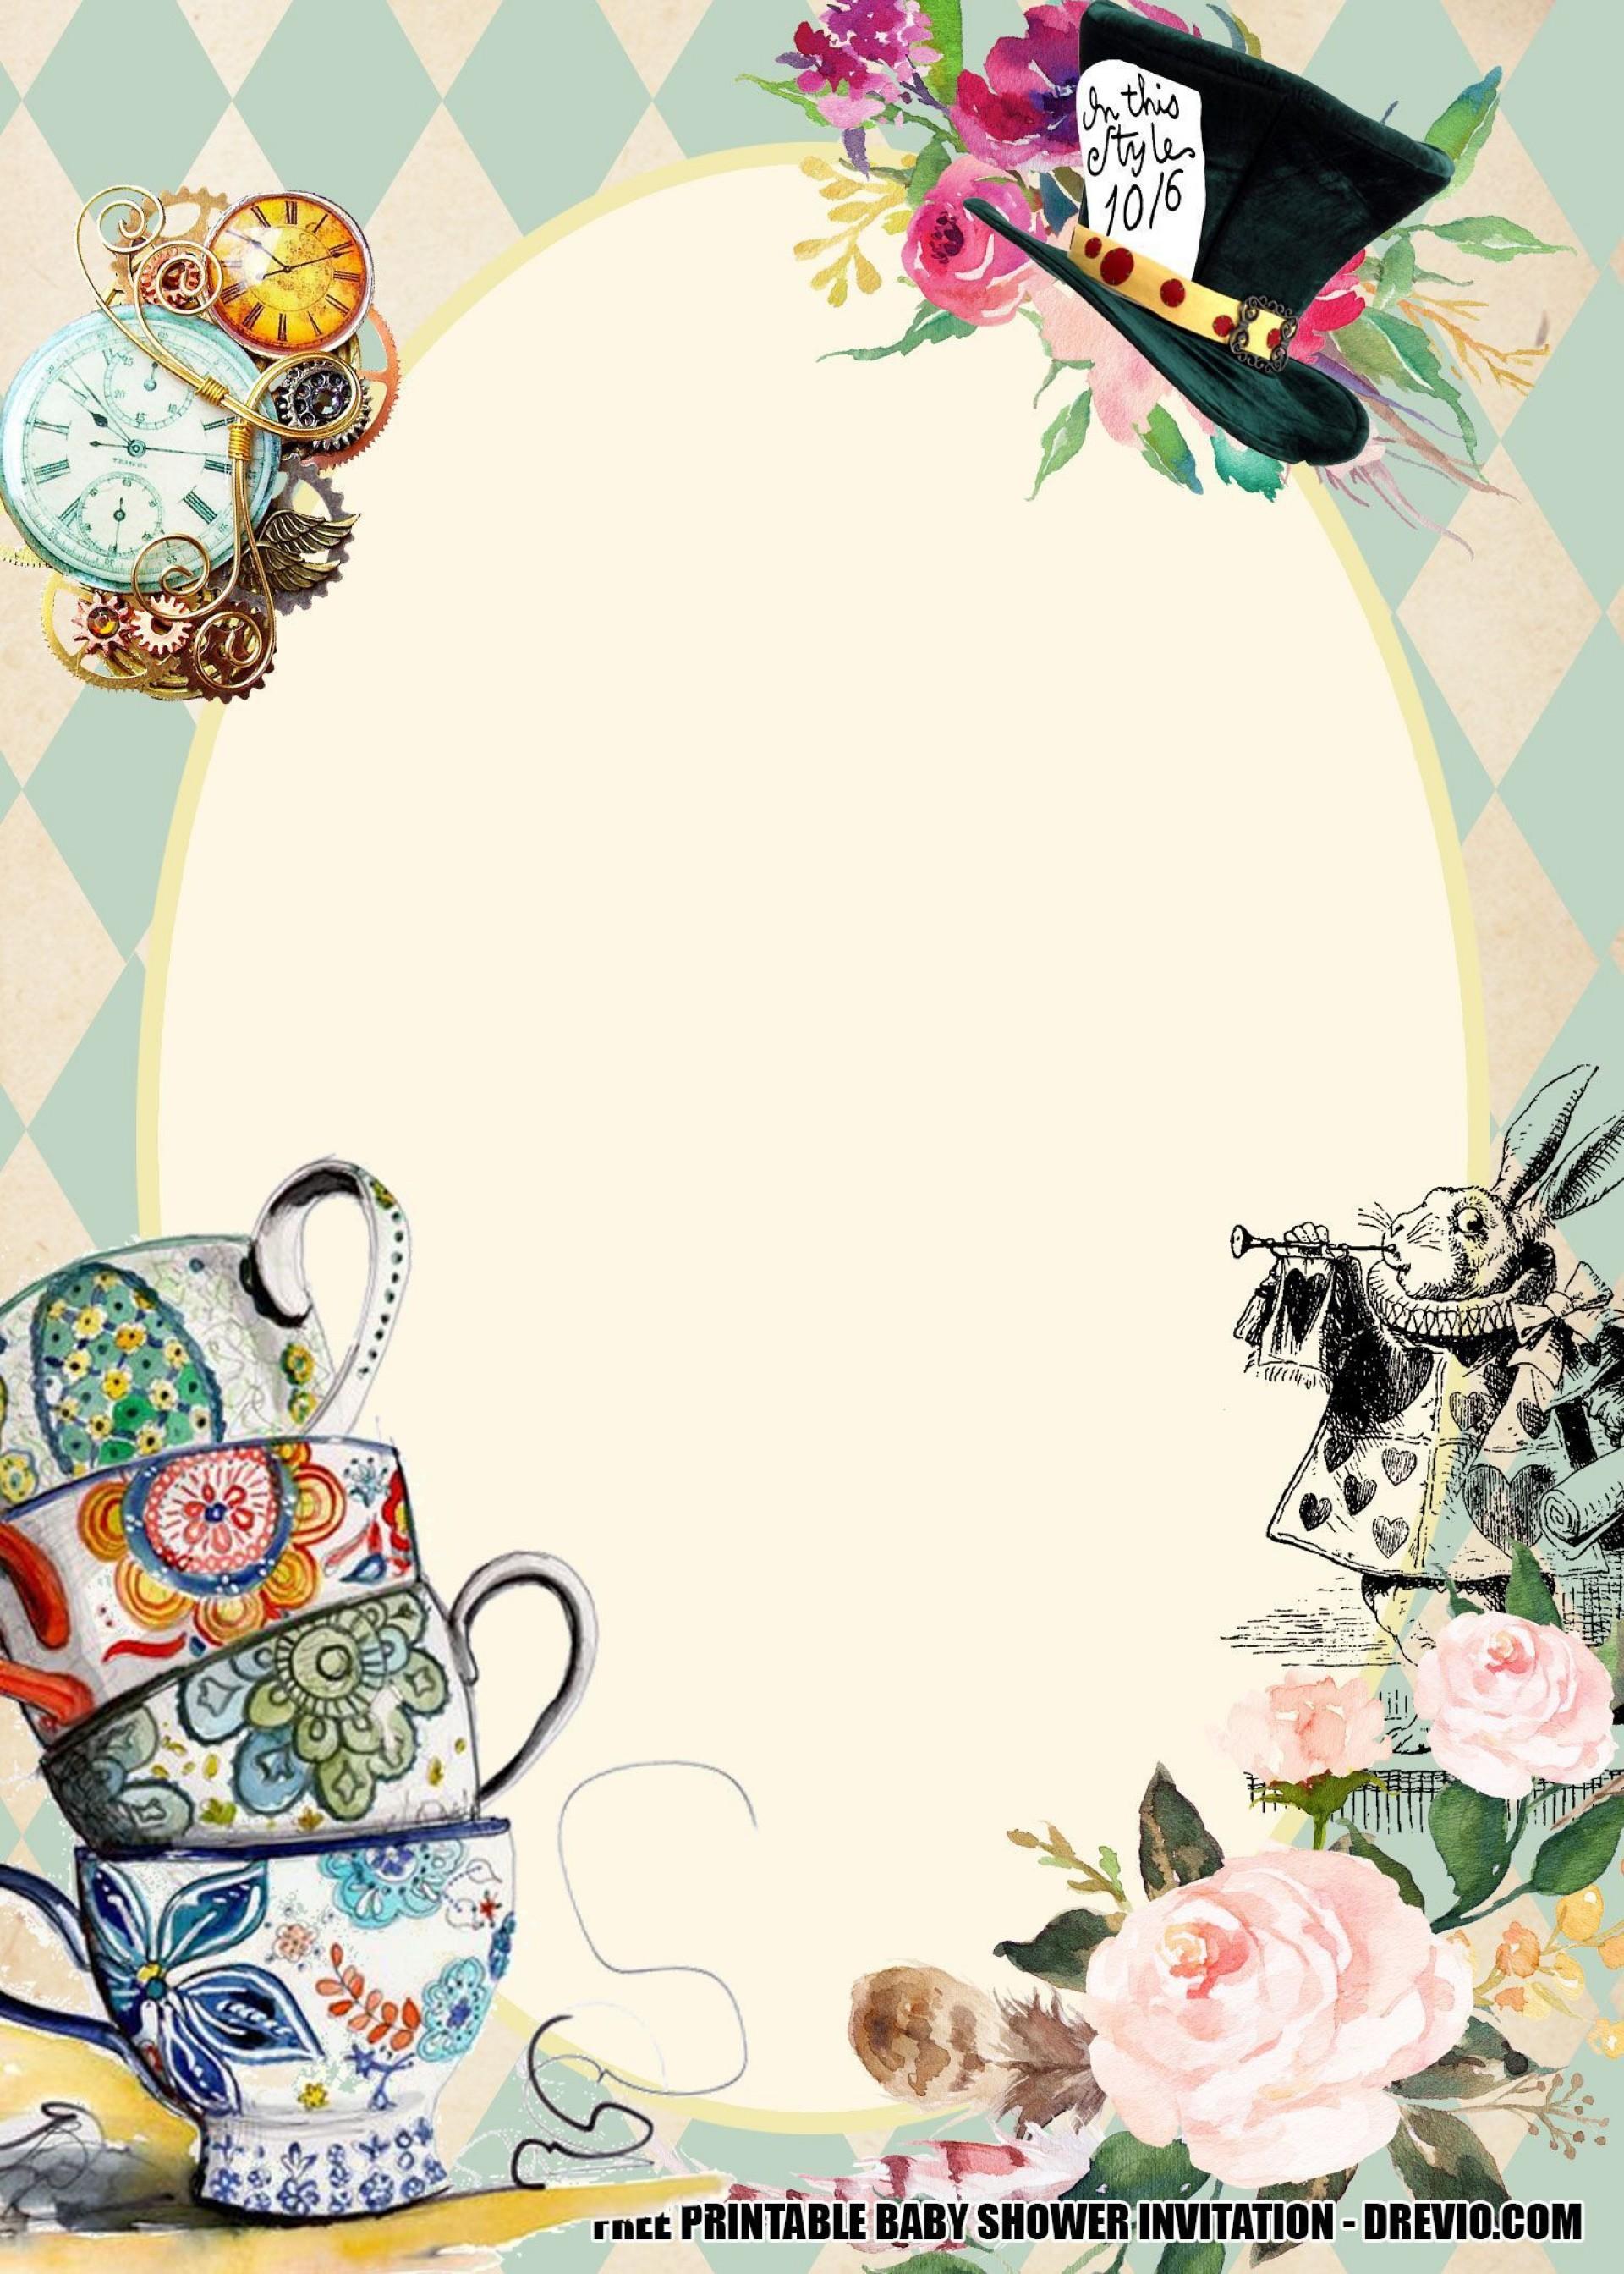 000 Sensational Alice In Wonderland Birthday Party Invitation Printable Free Inspiration 1920